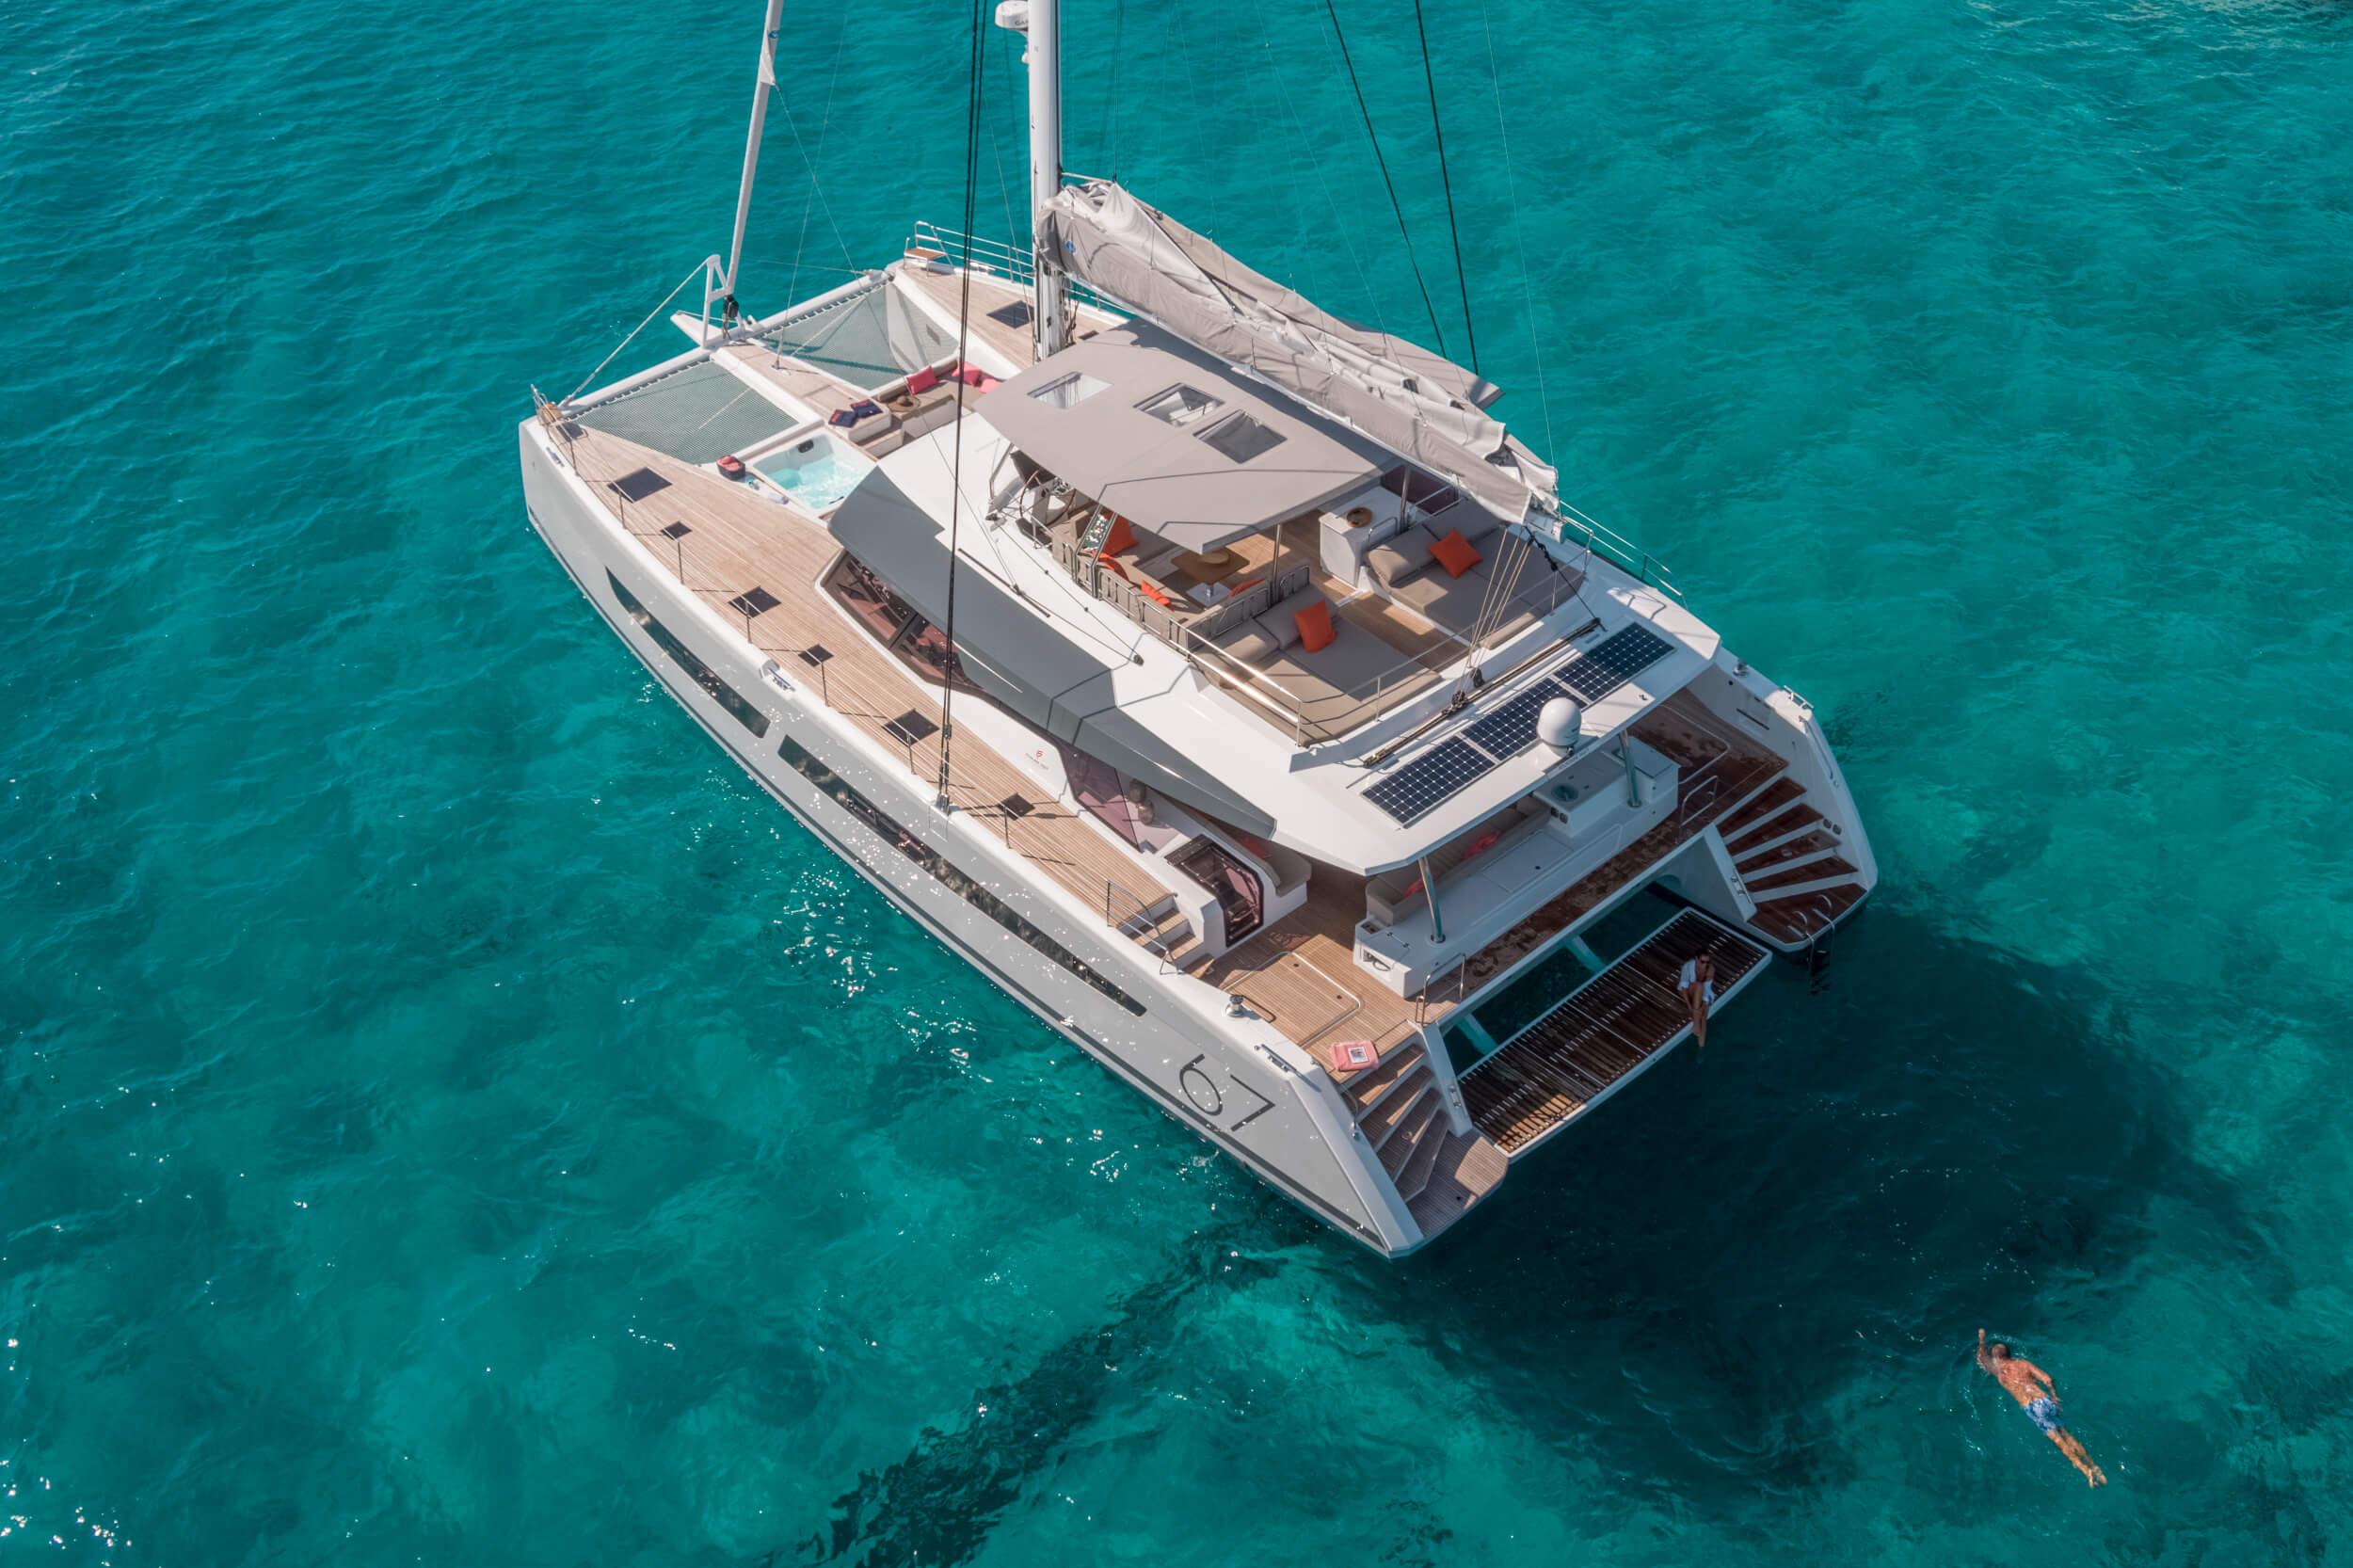 New Sail Catamaran for Sale  Alegria 67 Boat Highlights